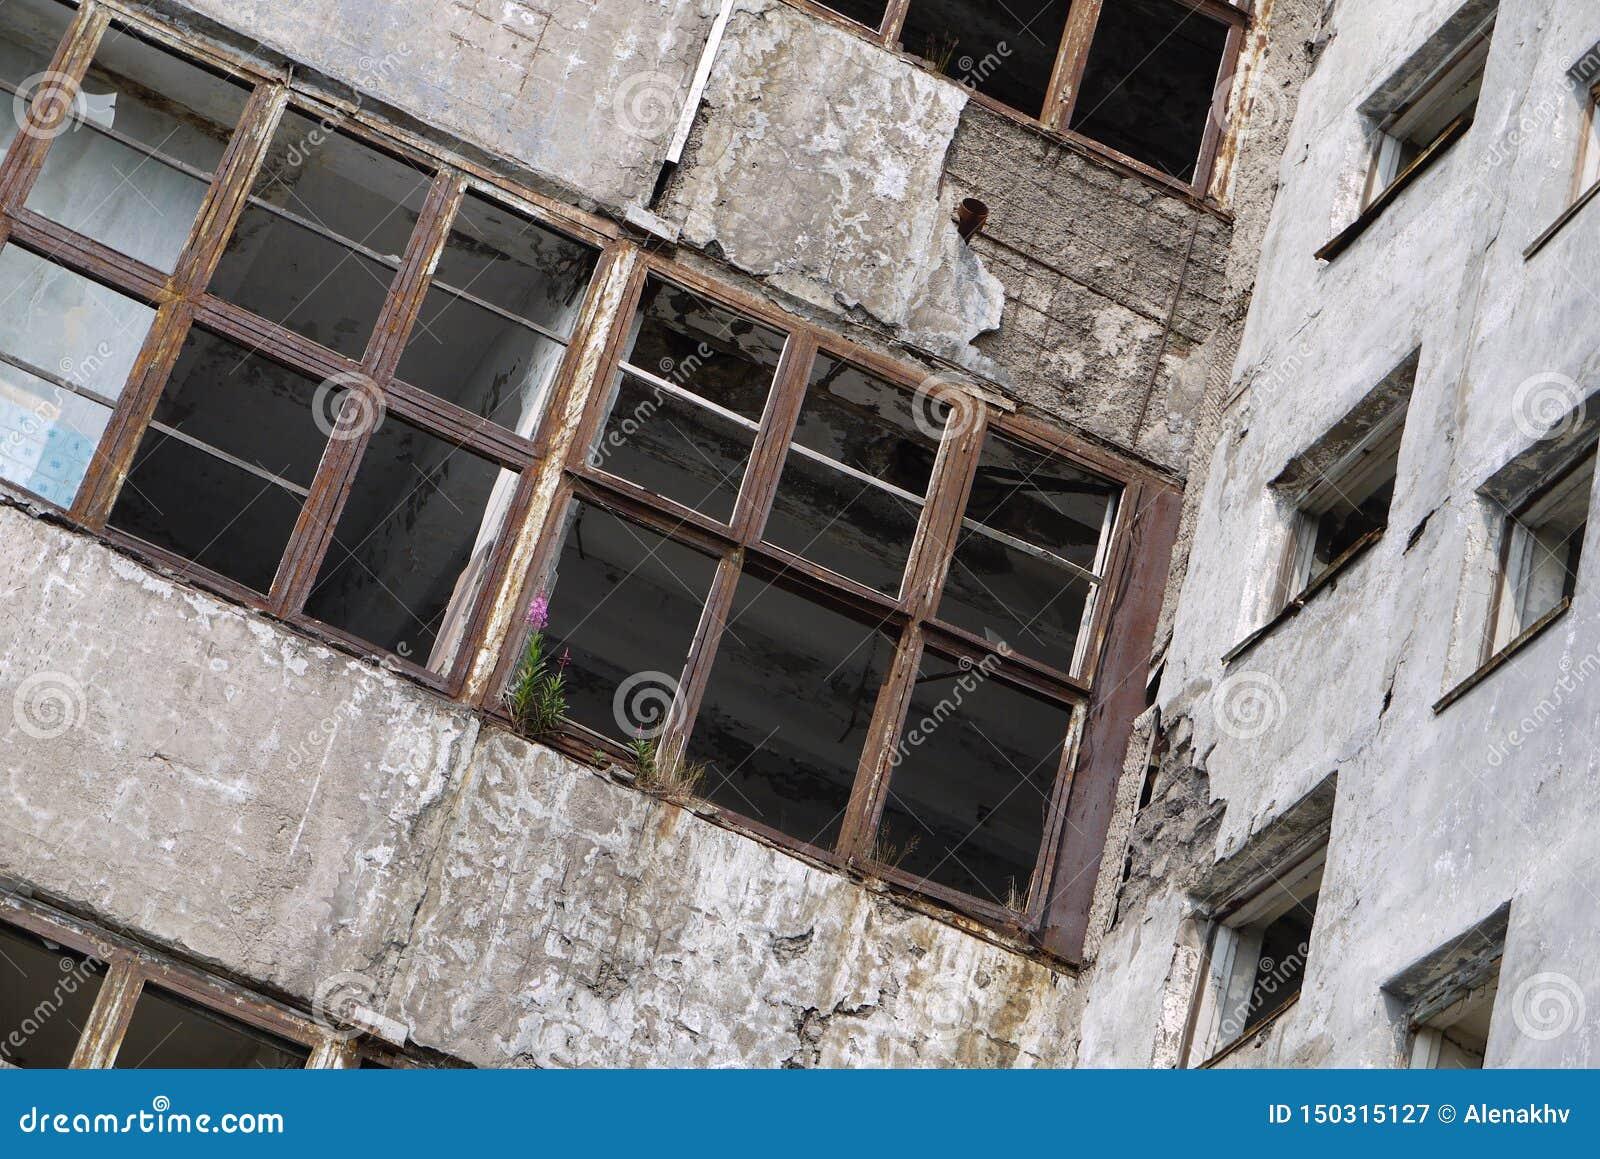 Взгляд стен и пустых окон получившегося отказ здания